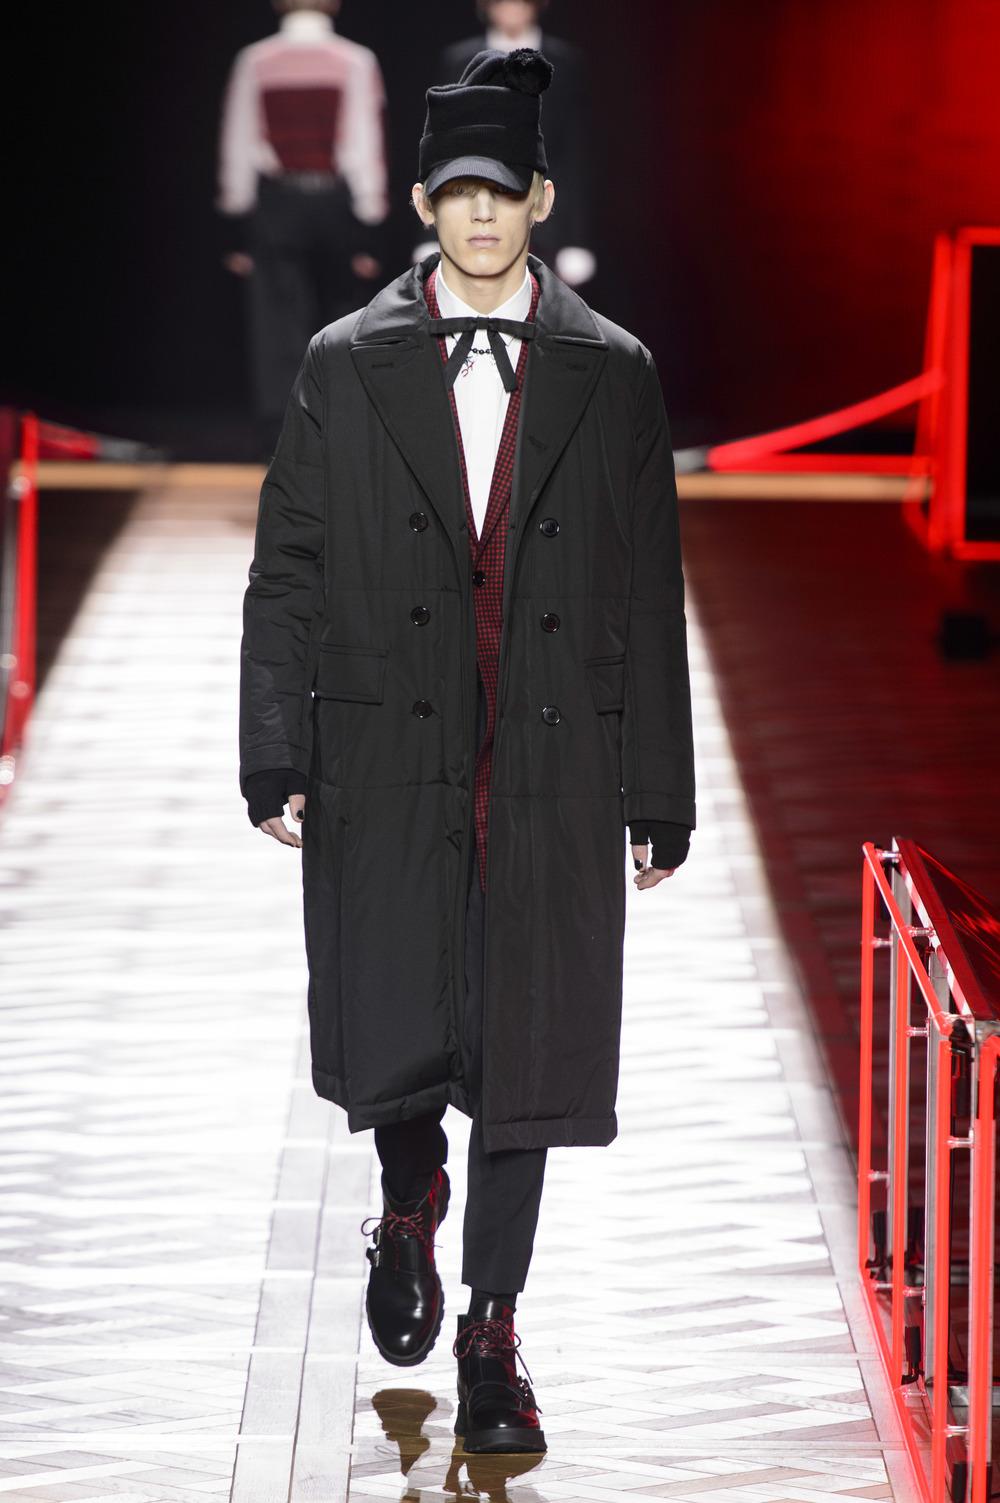 Dior_Homme_Hiver2016-17_look_11.JPG